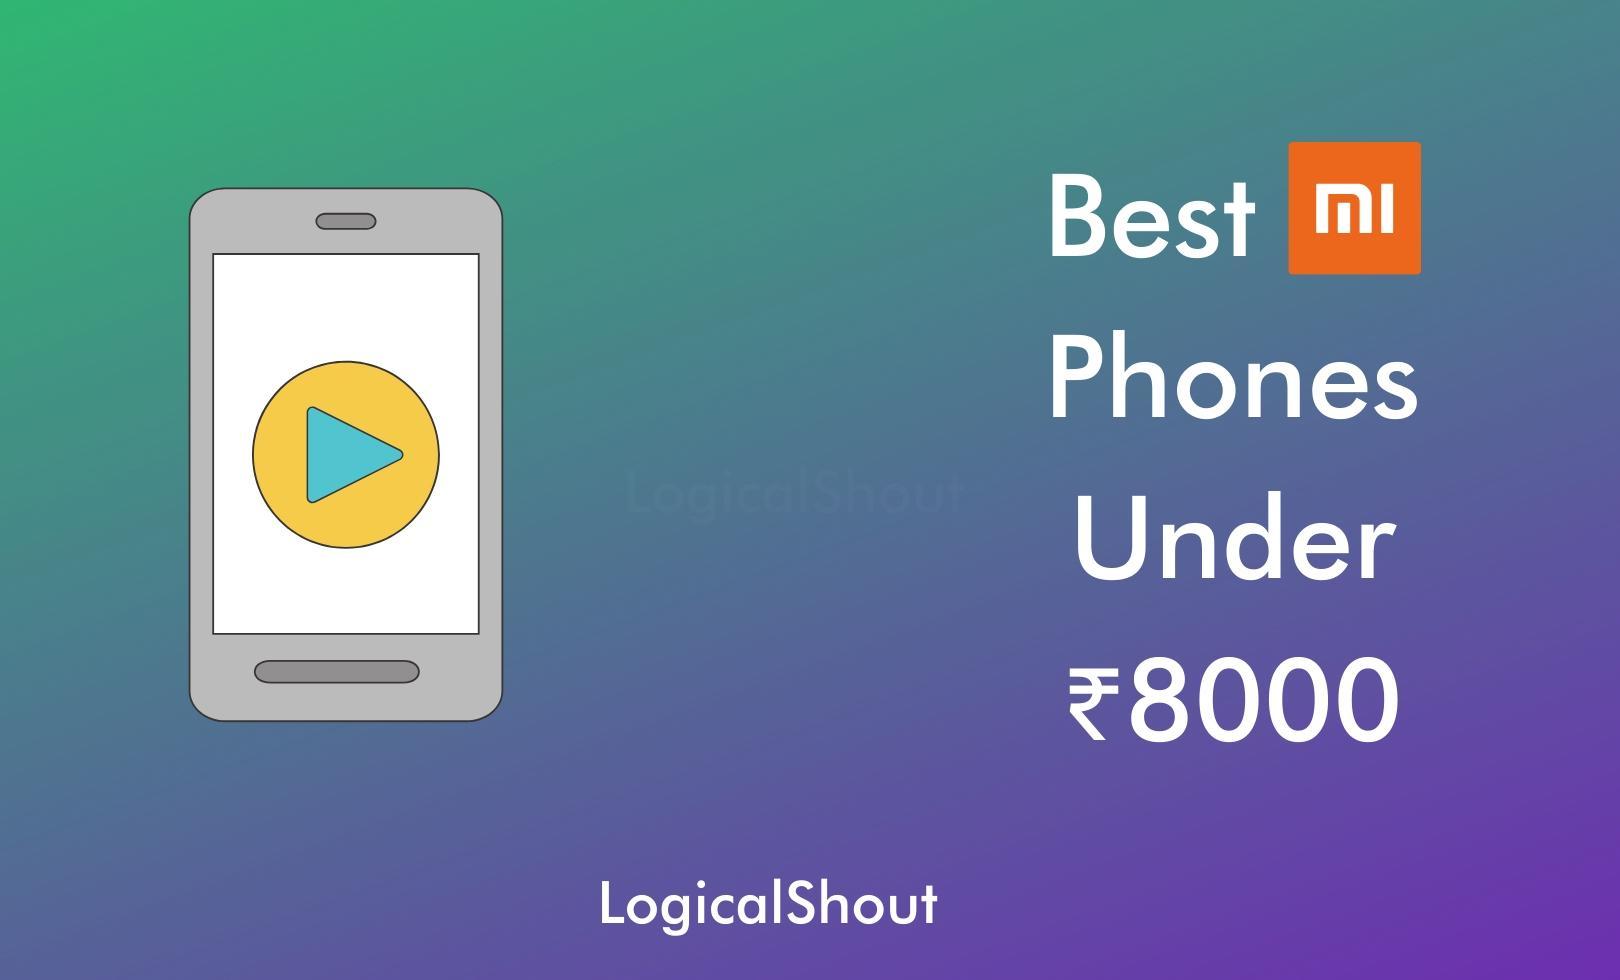 Best Mi Phones Under 8000